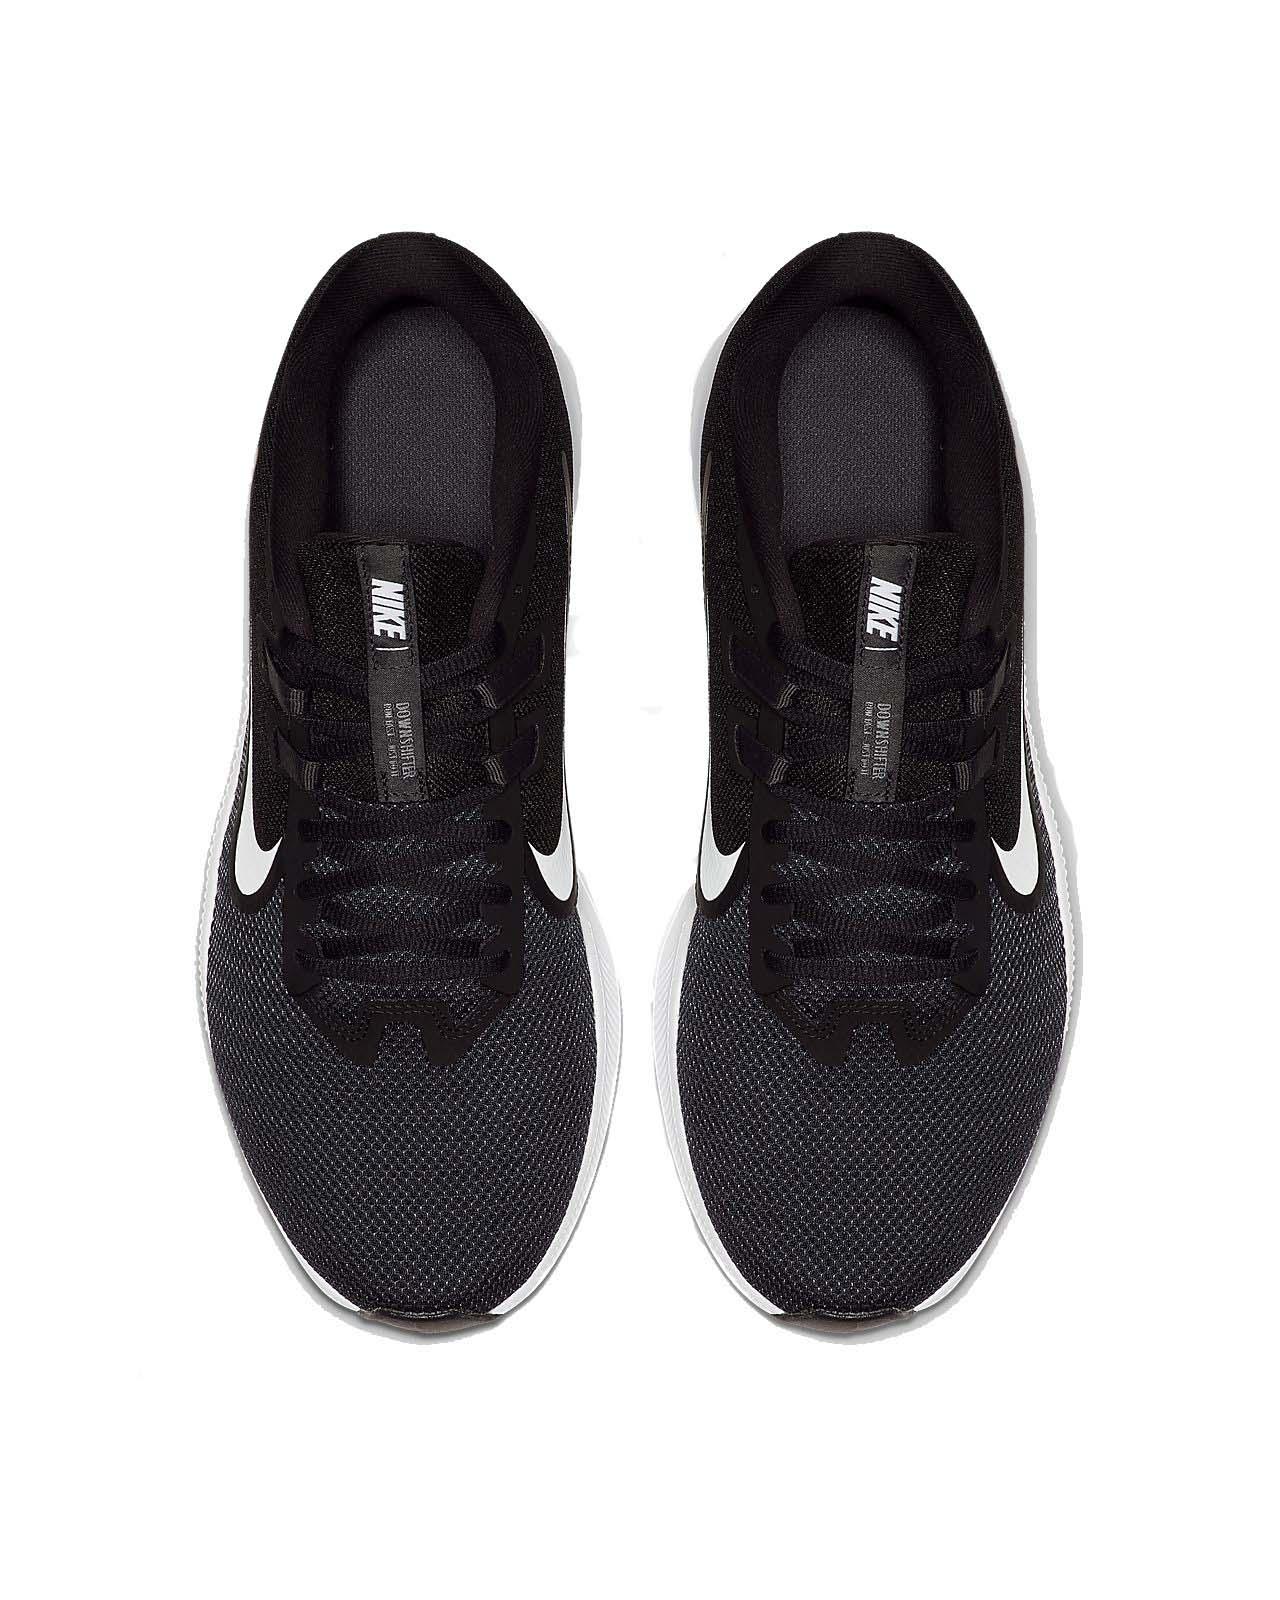 Nike-Men-039-s-Downshifter-9-Wide-Running-Shoes thumbnail 4